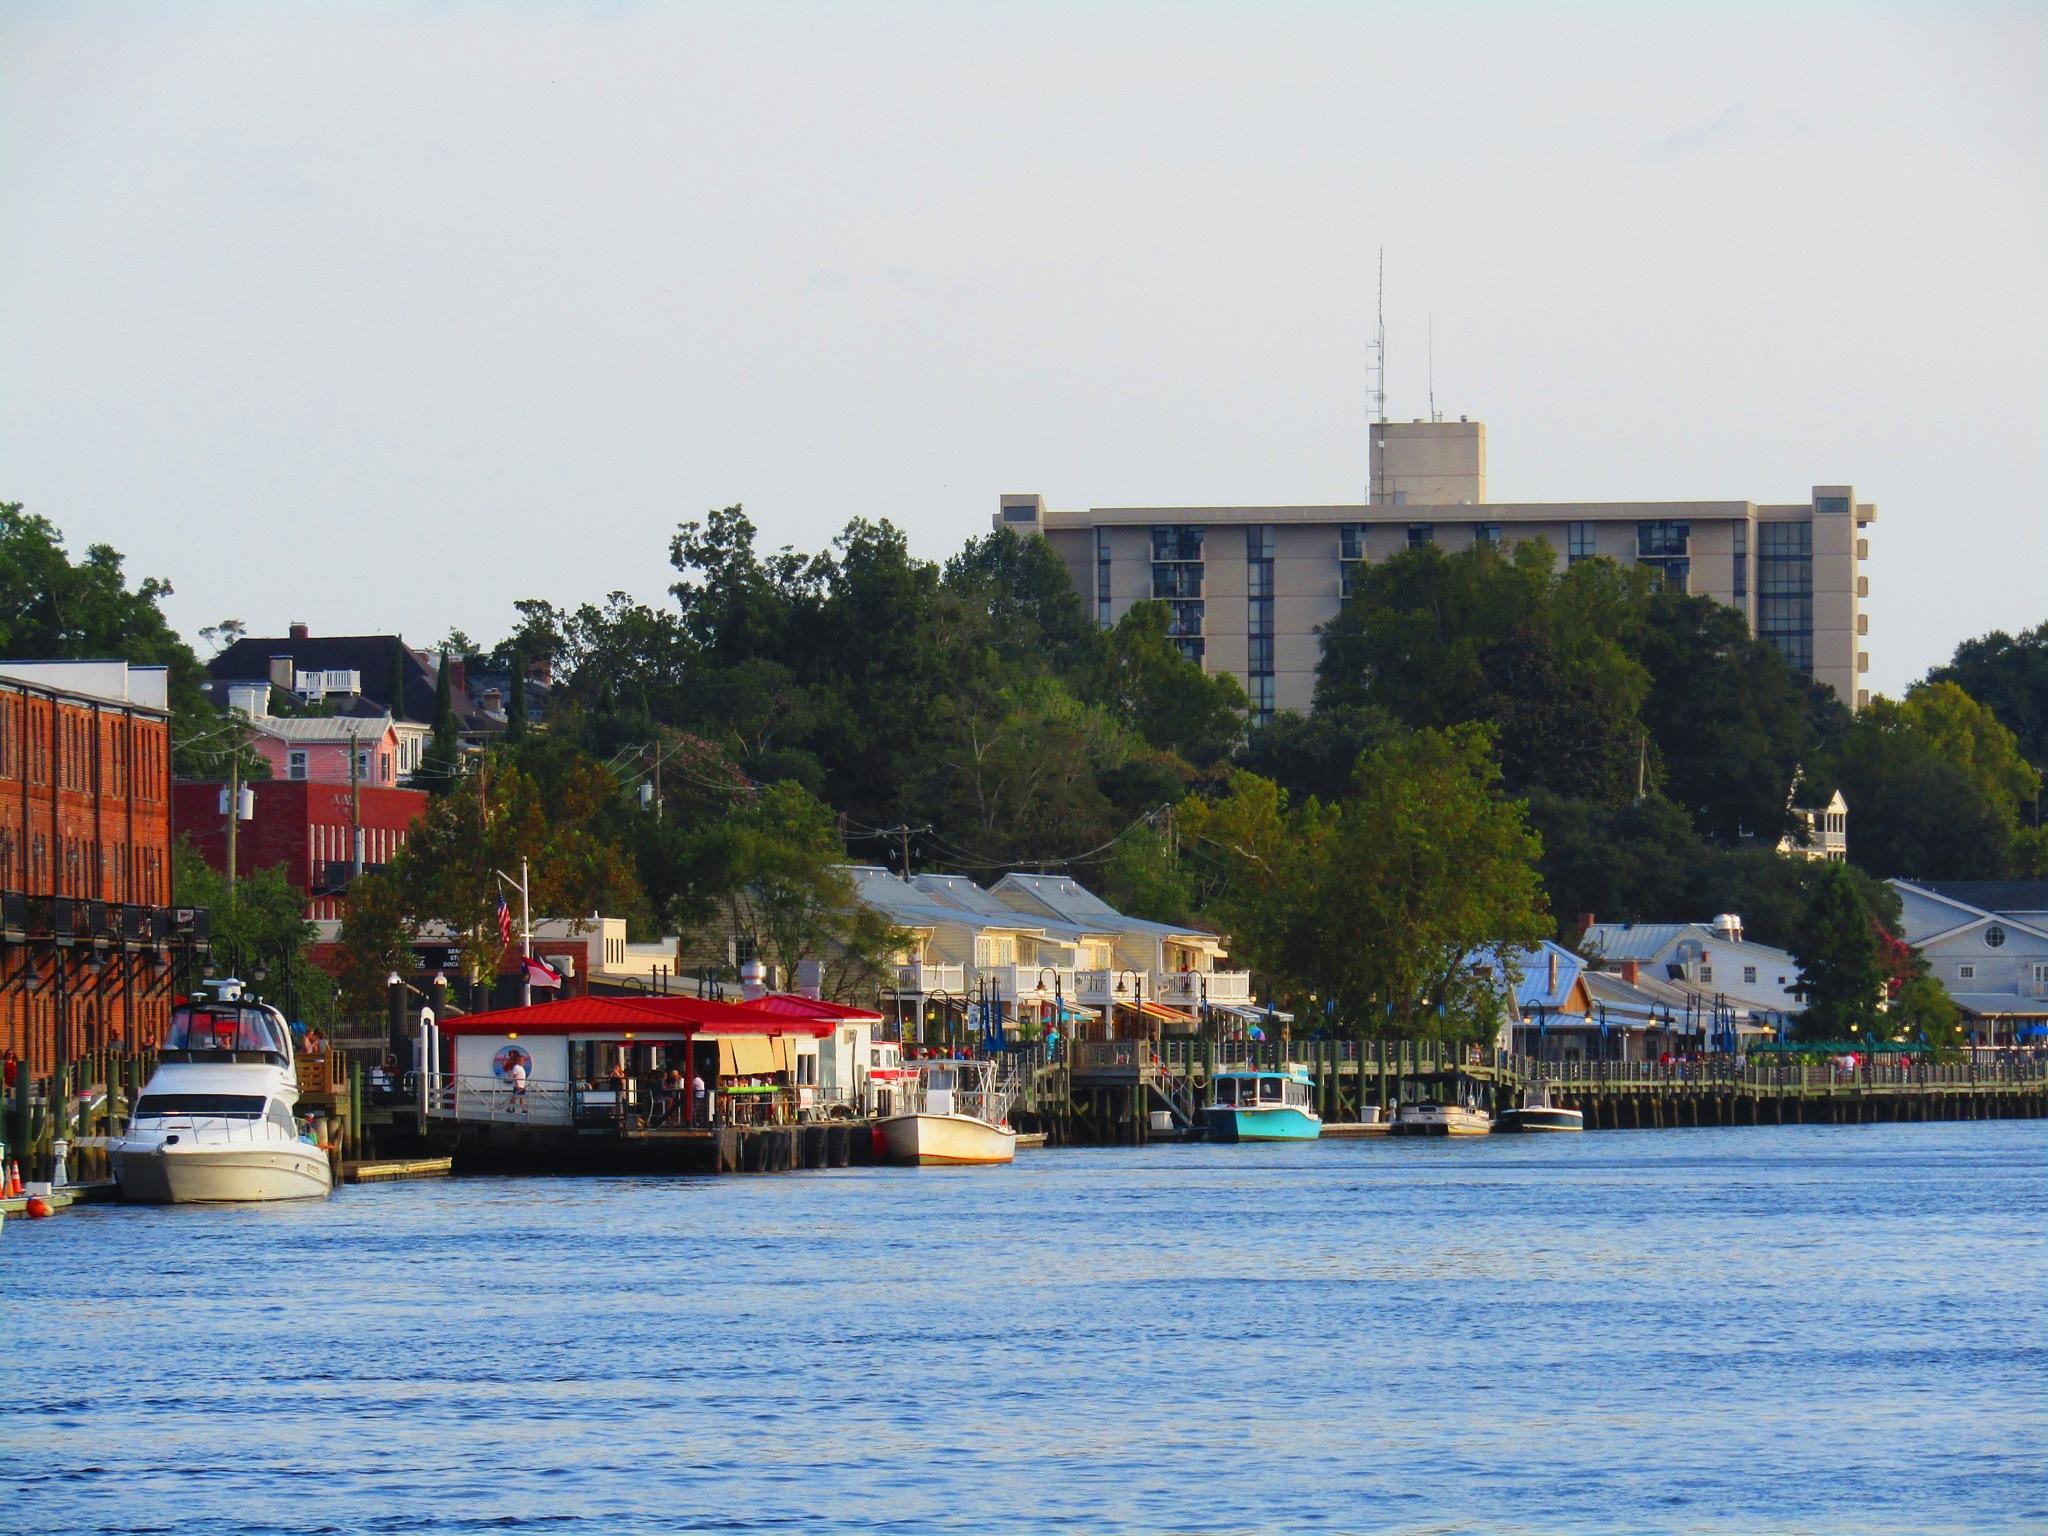 Wilmington Riverwalk by StevenKlabunde